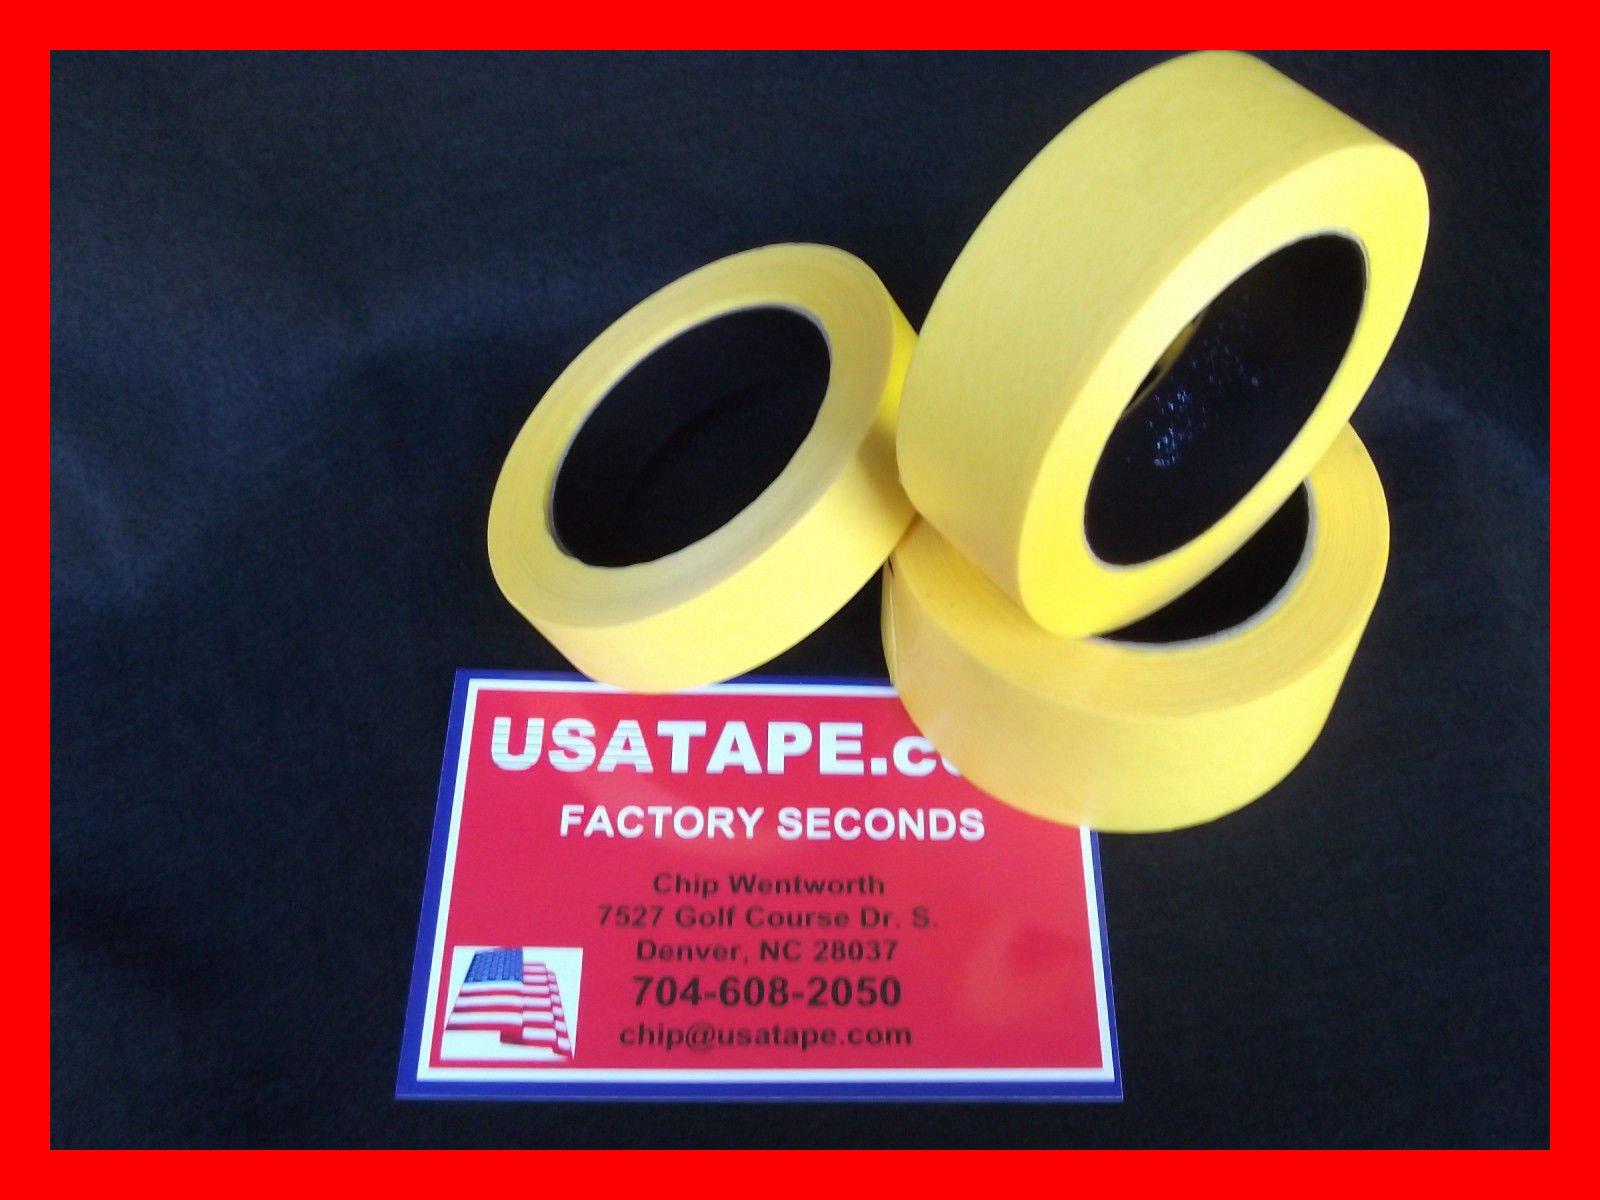 Lot Of 48 Rolls 1'' X60Fine Edge Yellow Painters Masking Tape USA by USA Tape